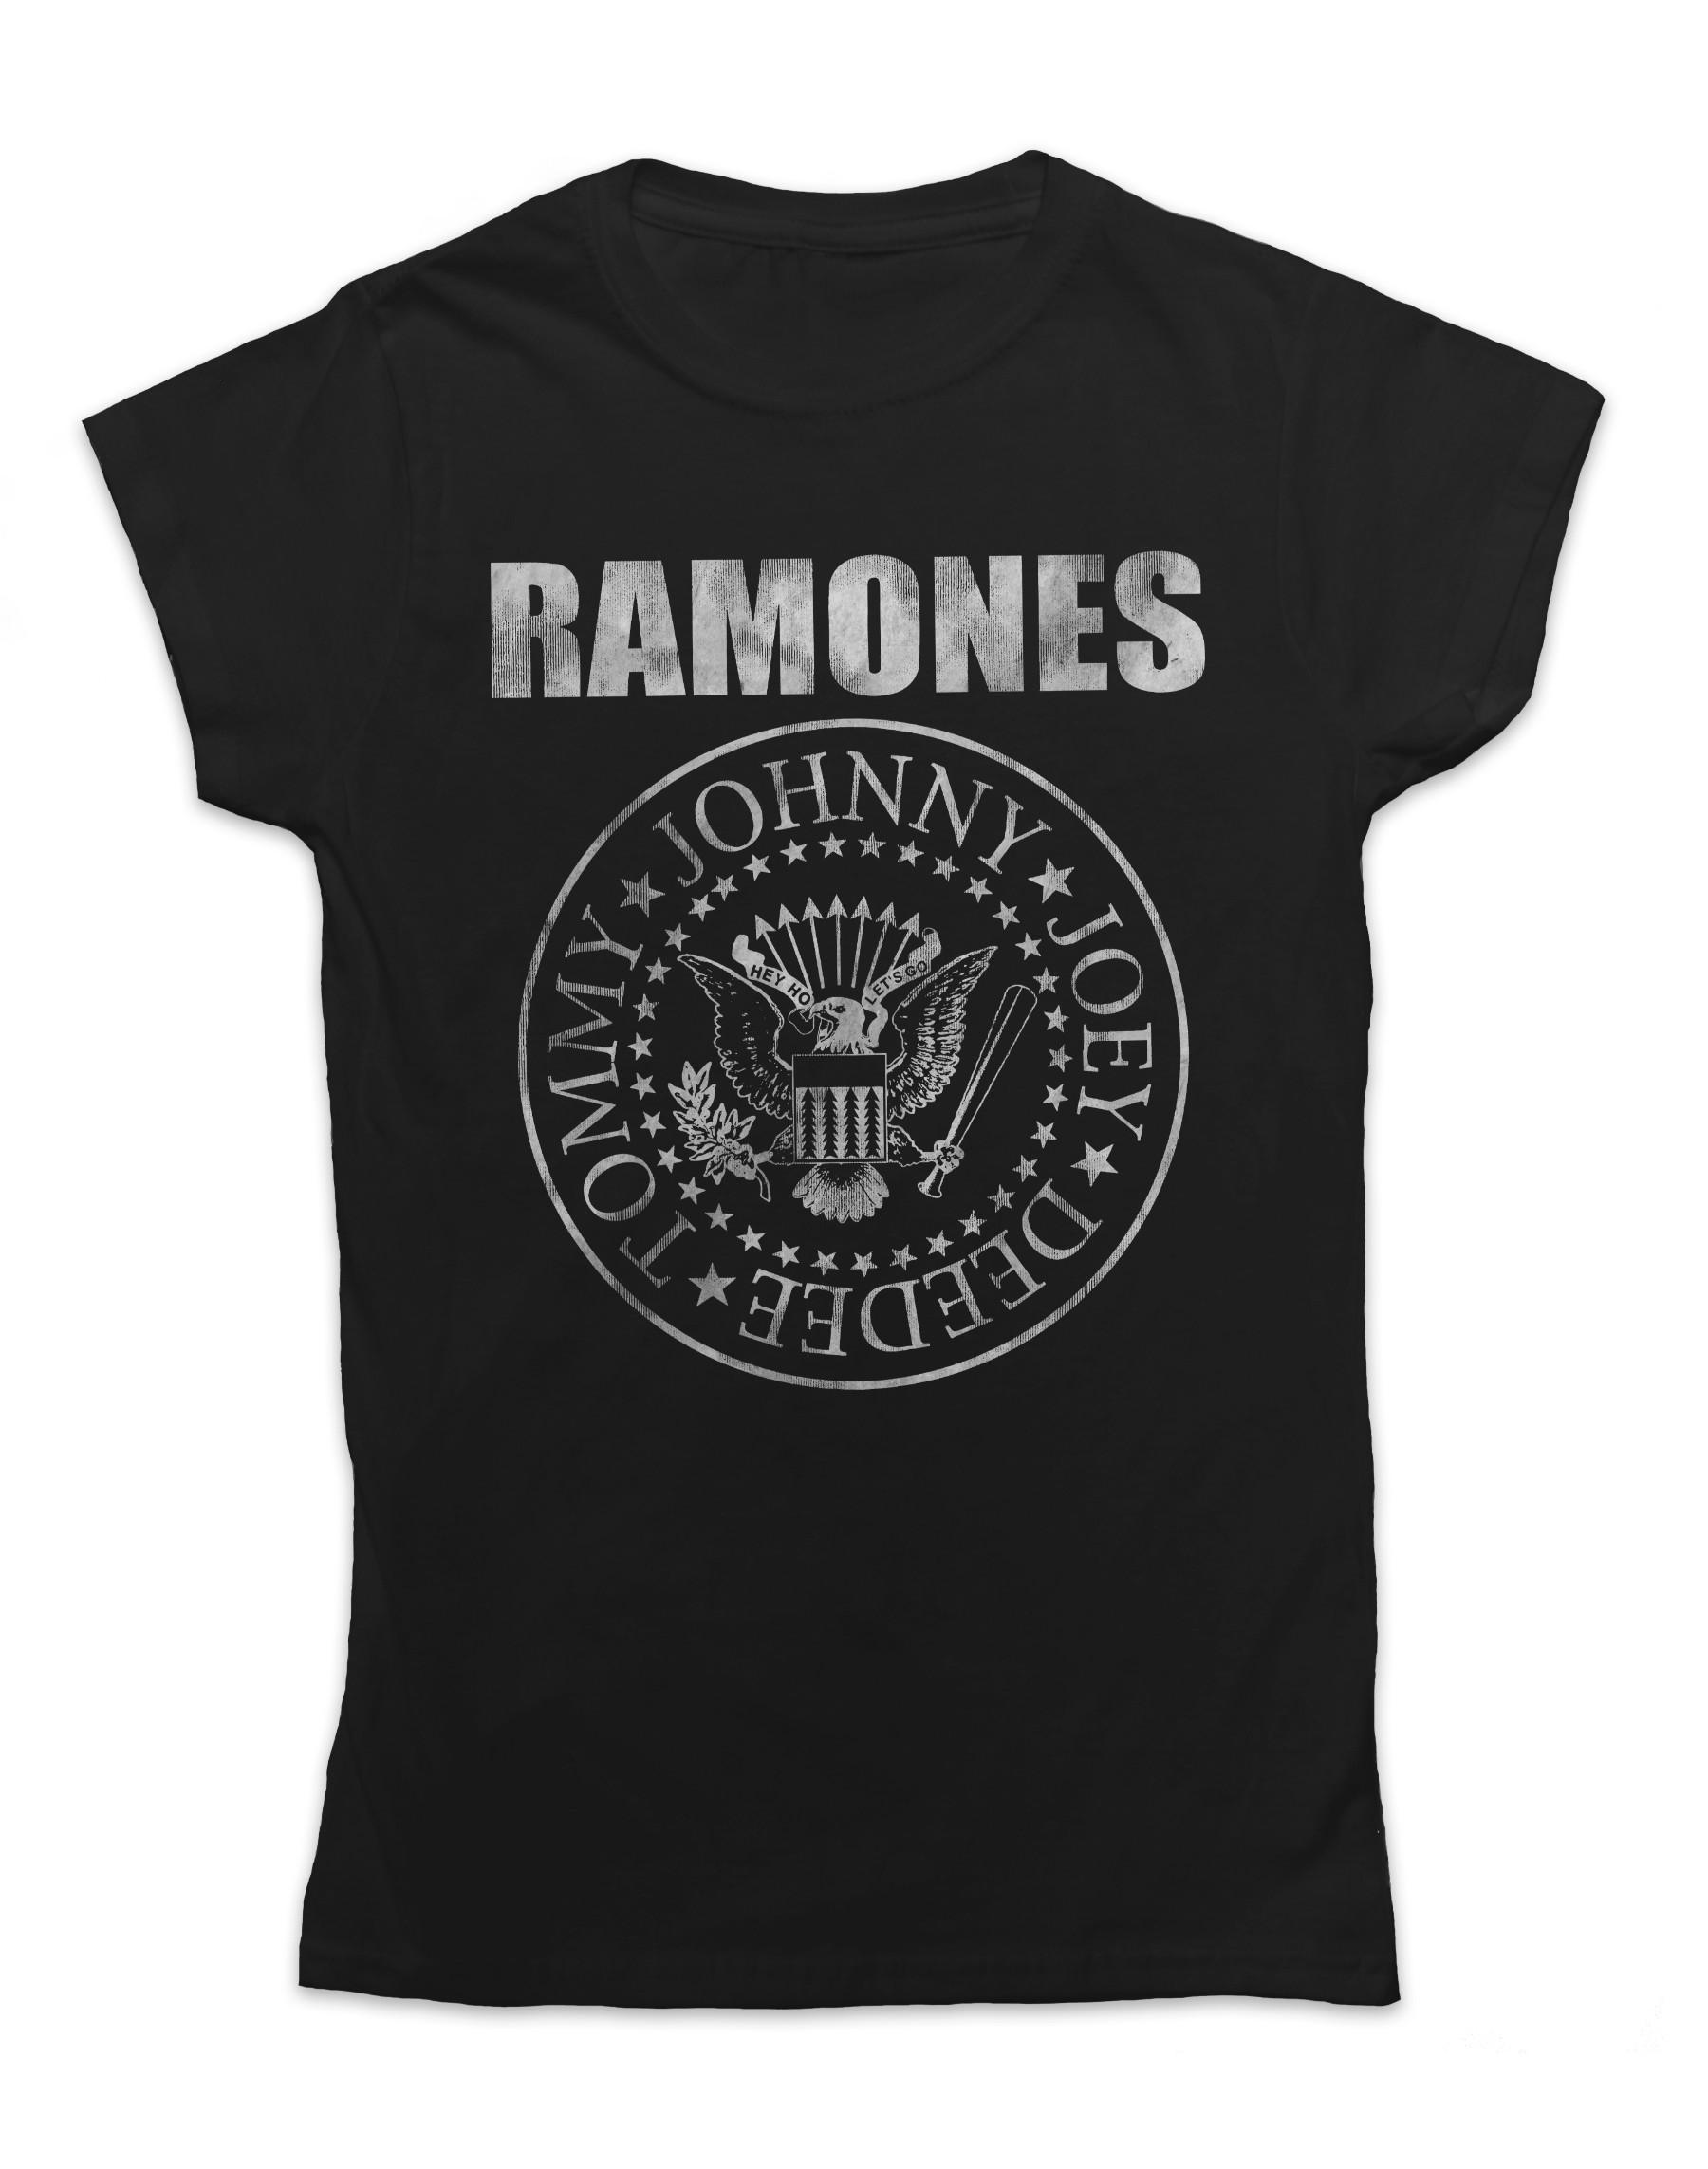 Ramones Women's Distressed Seal T-Shirt